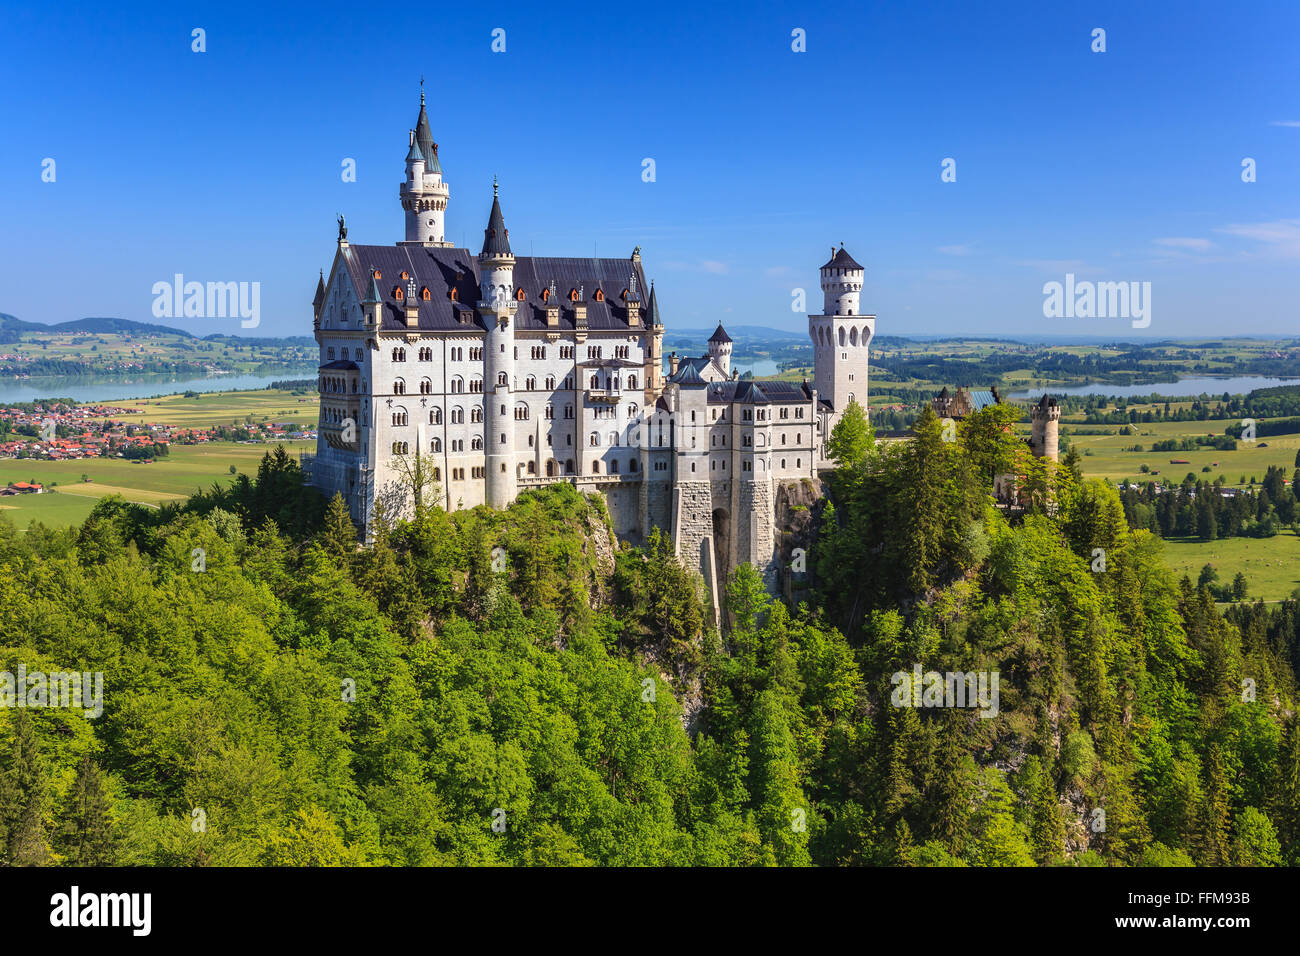 El castillo de Neuschwanstein , Fussen , Baviera, Alemania Imagen De Stock